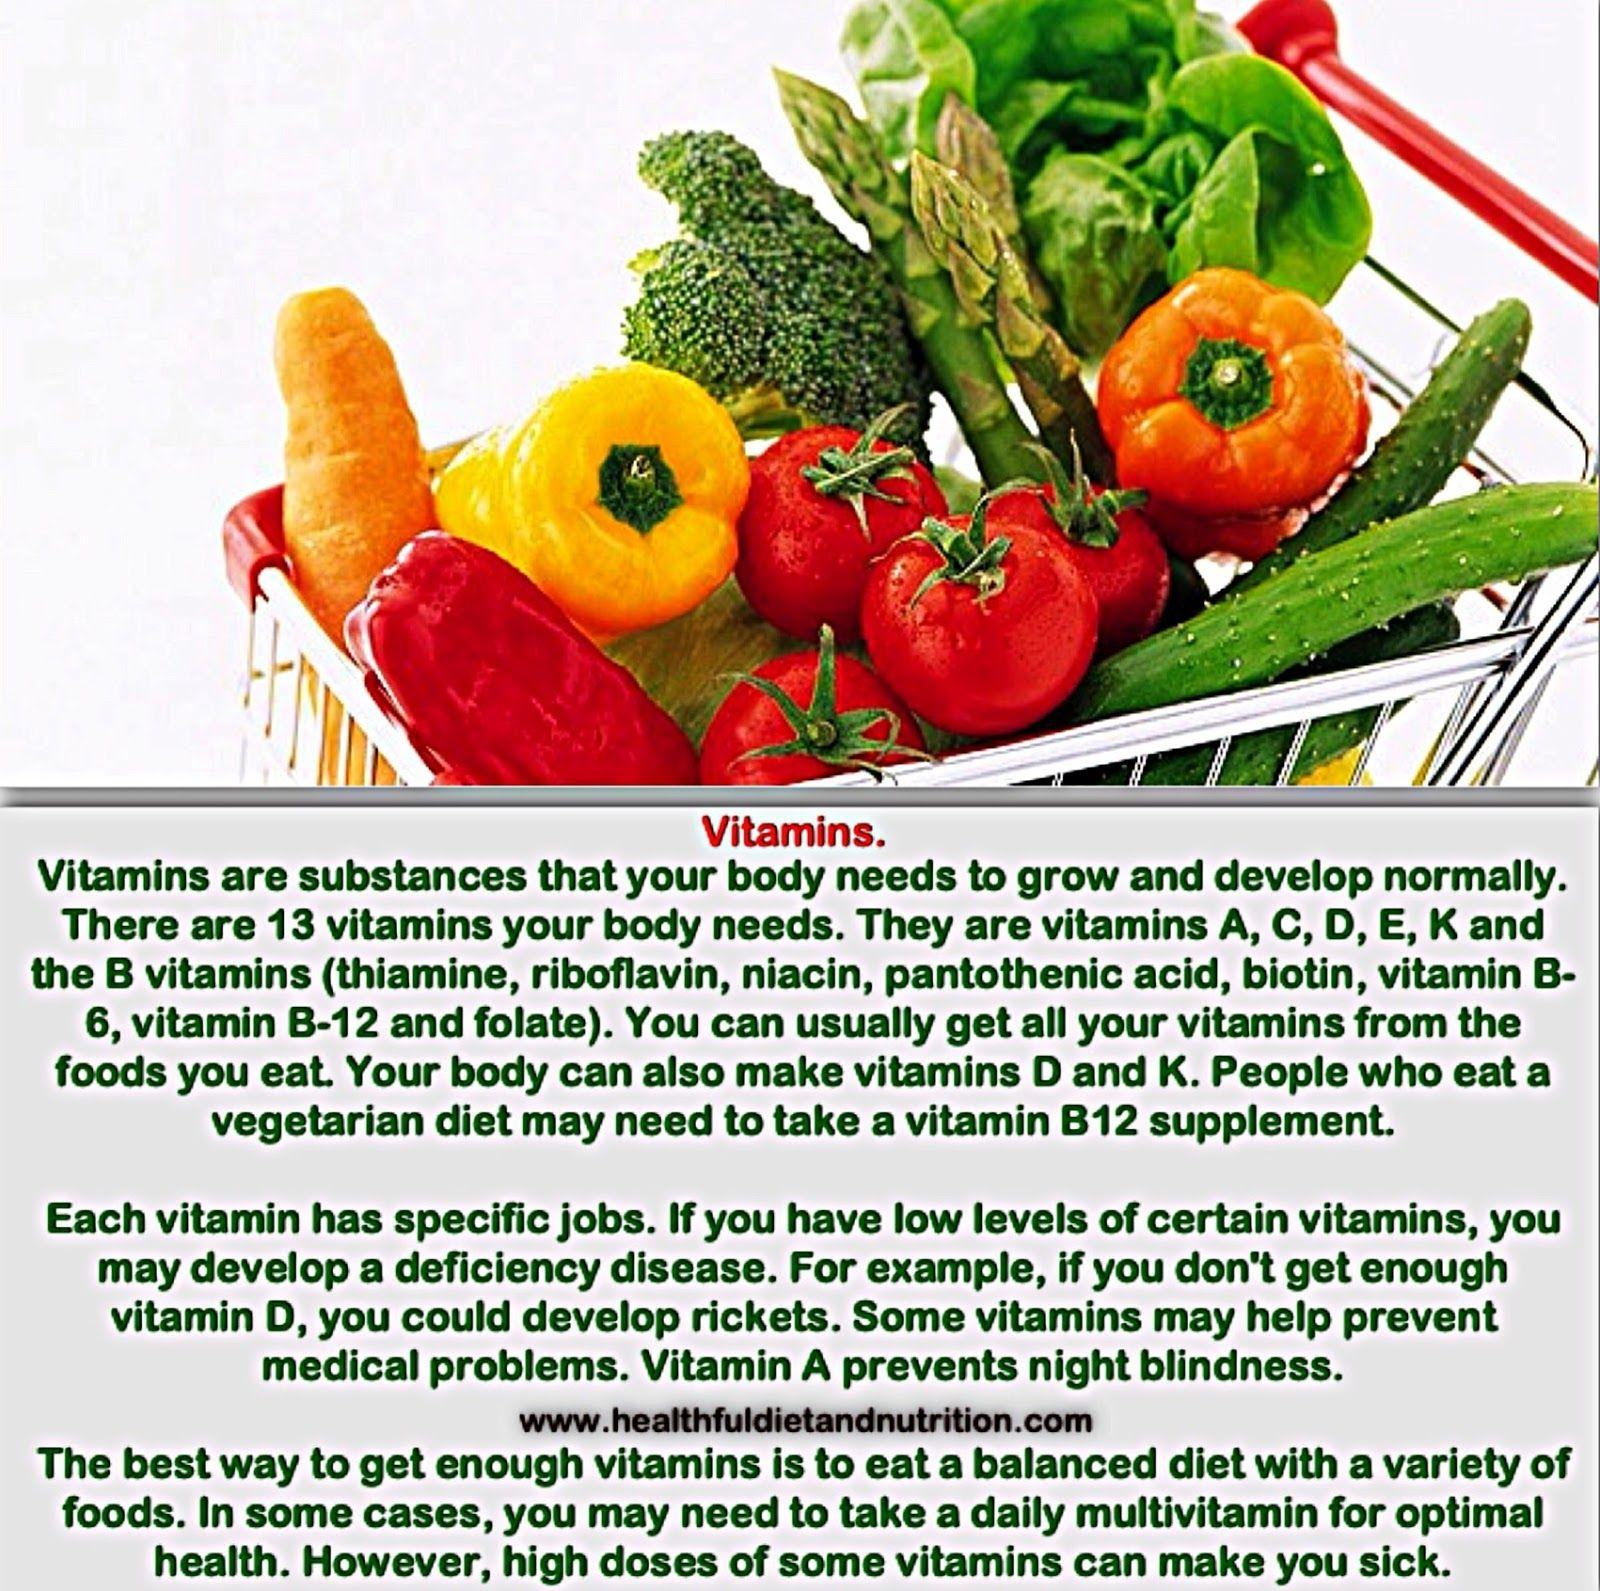 Idea by Karen Dalton on Nutritional information Diet and